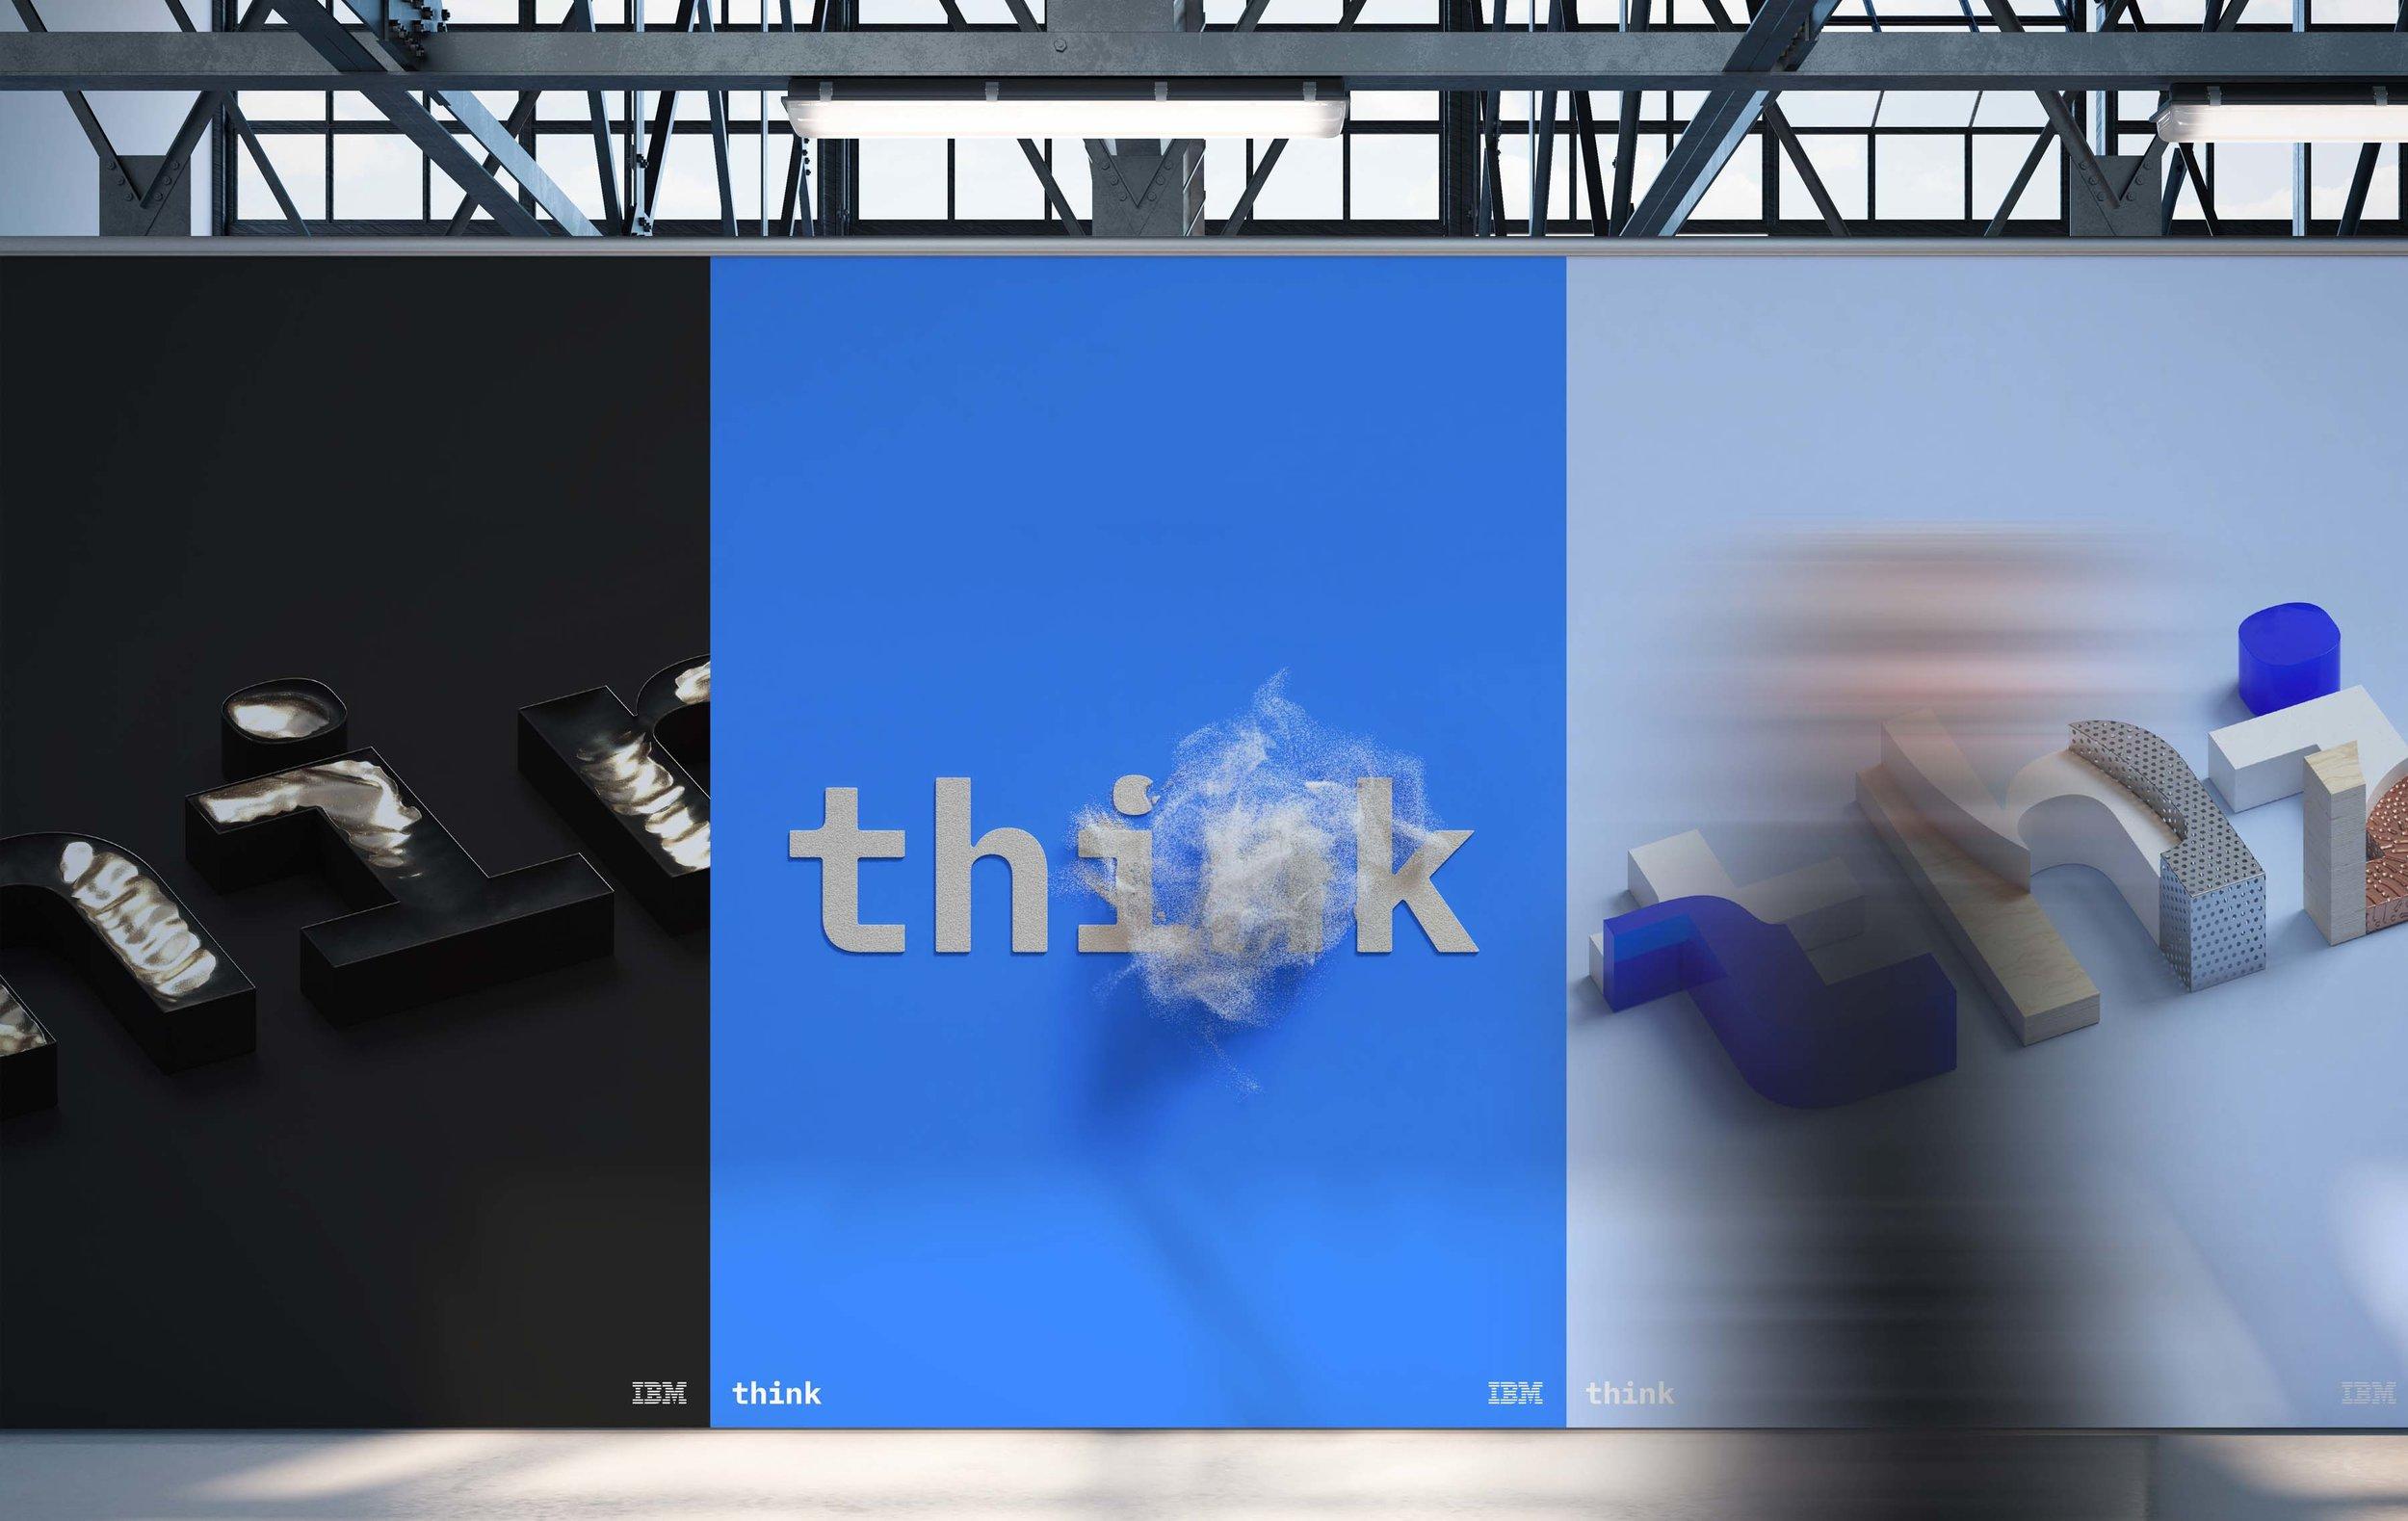 IBM_Think_Posters.jpg